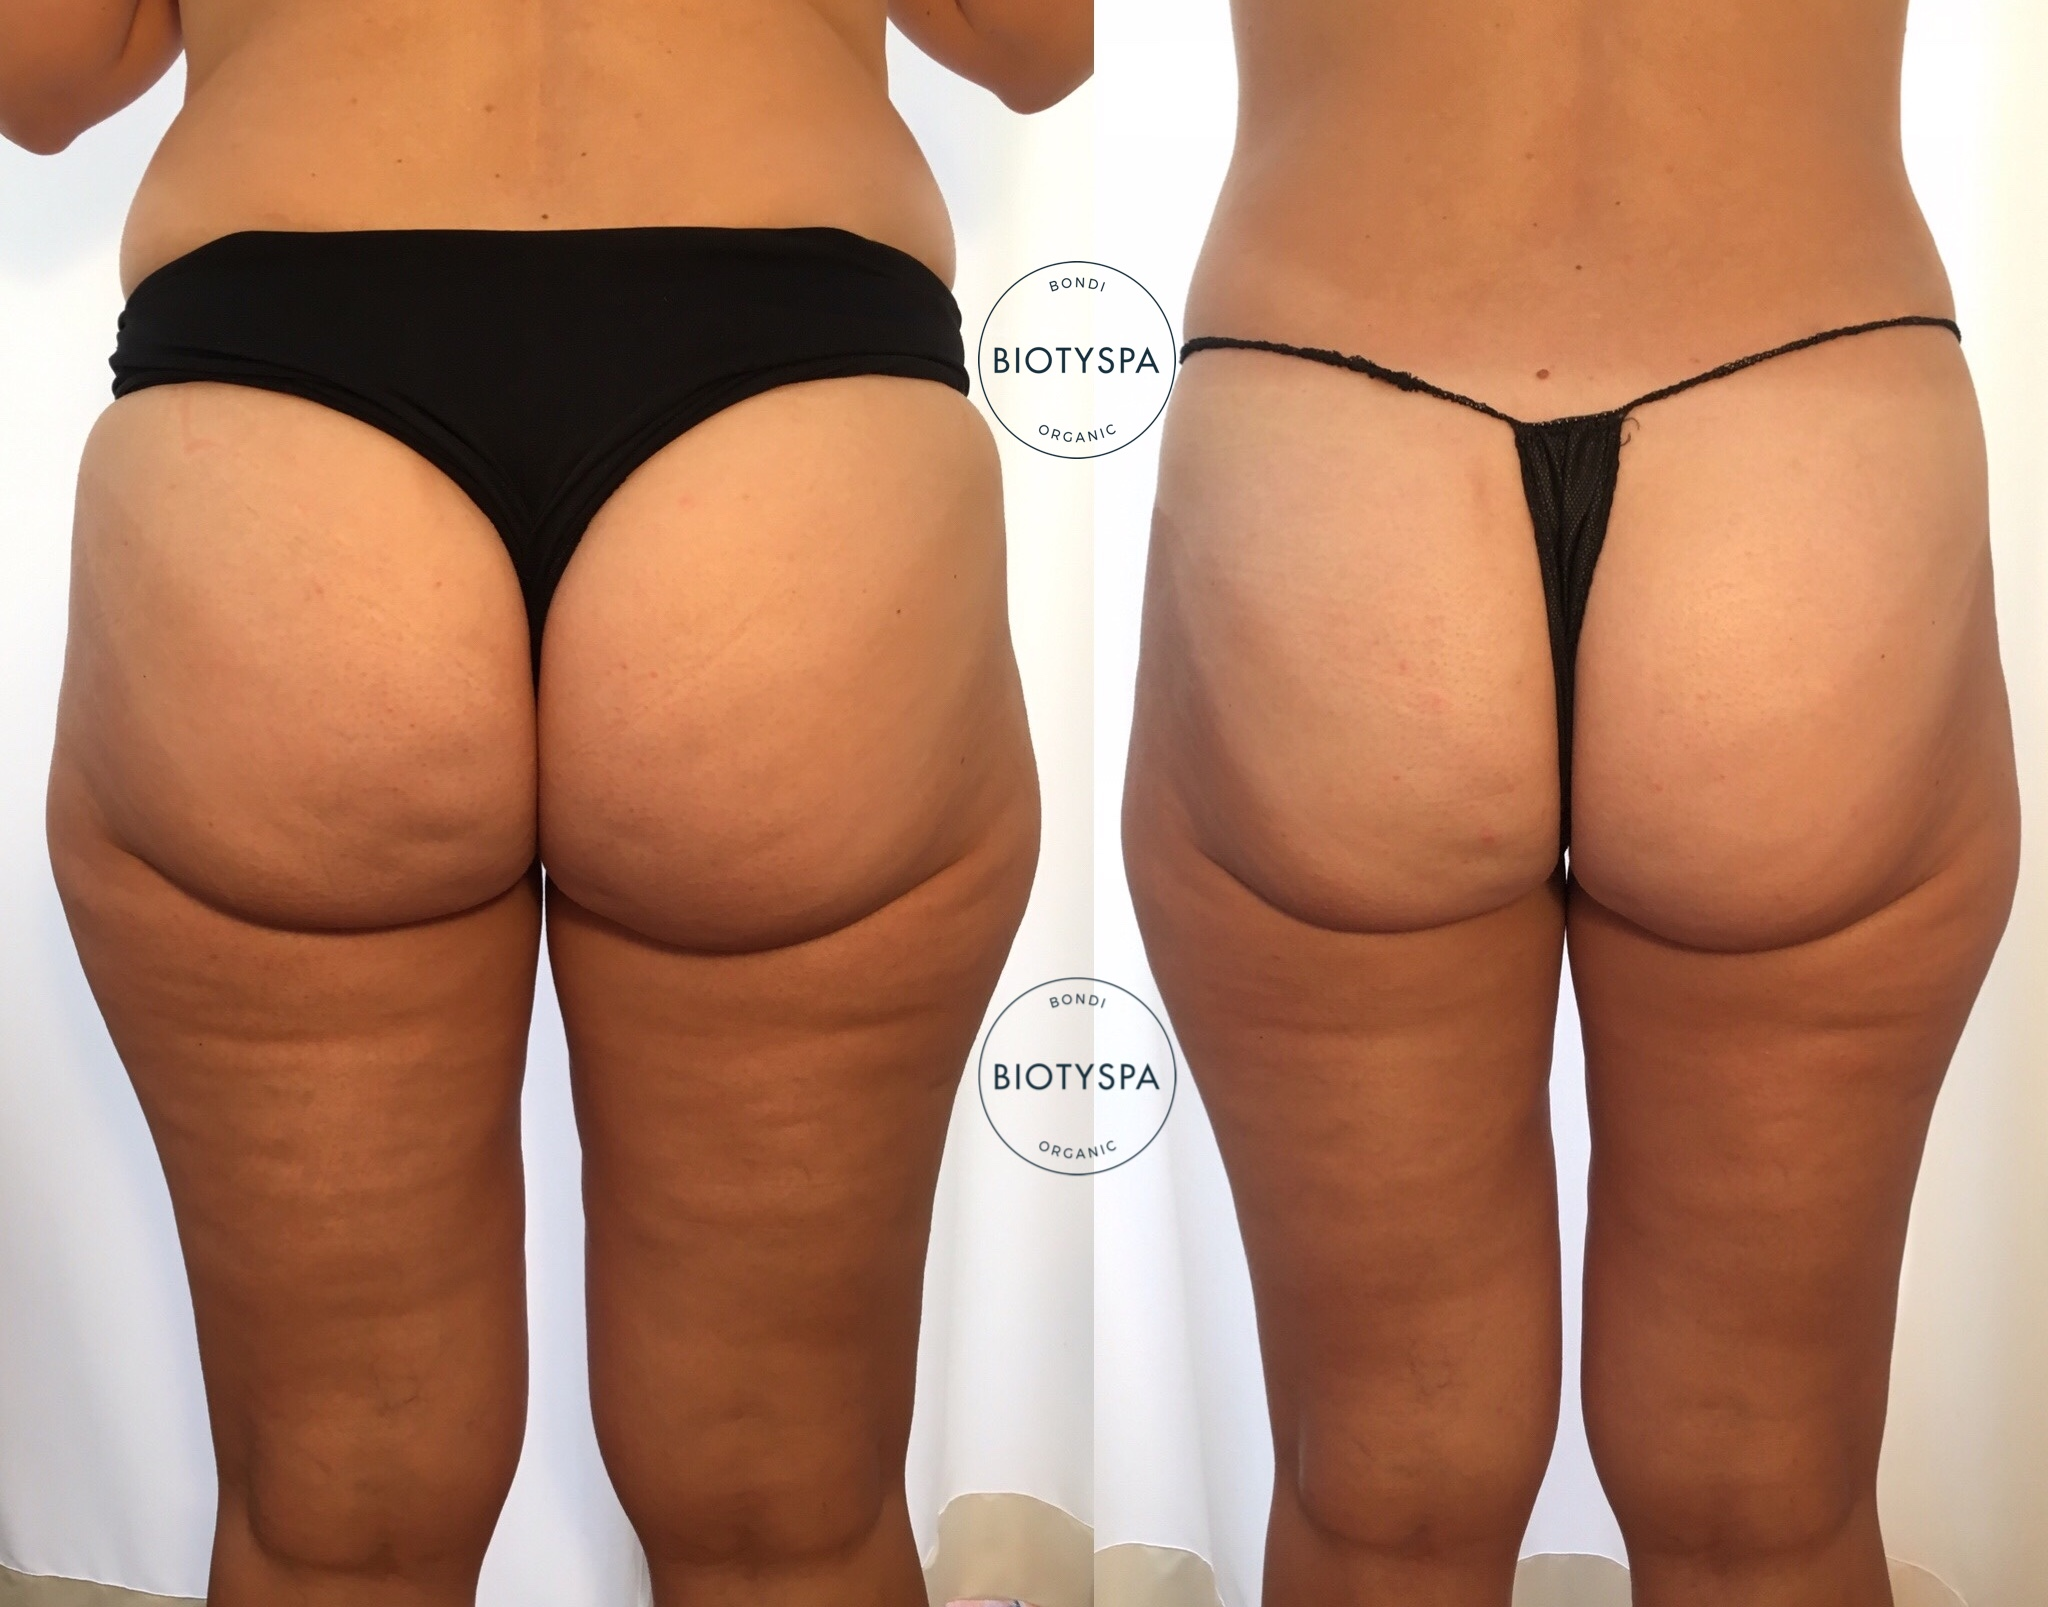 cellulite-treatment-biotyspa-activeslim.jpg